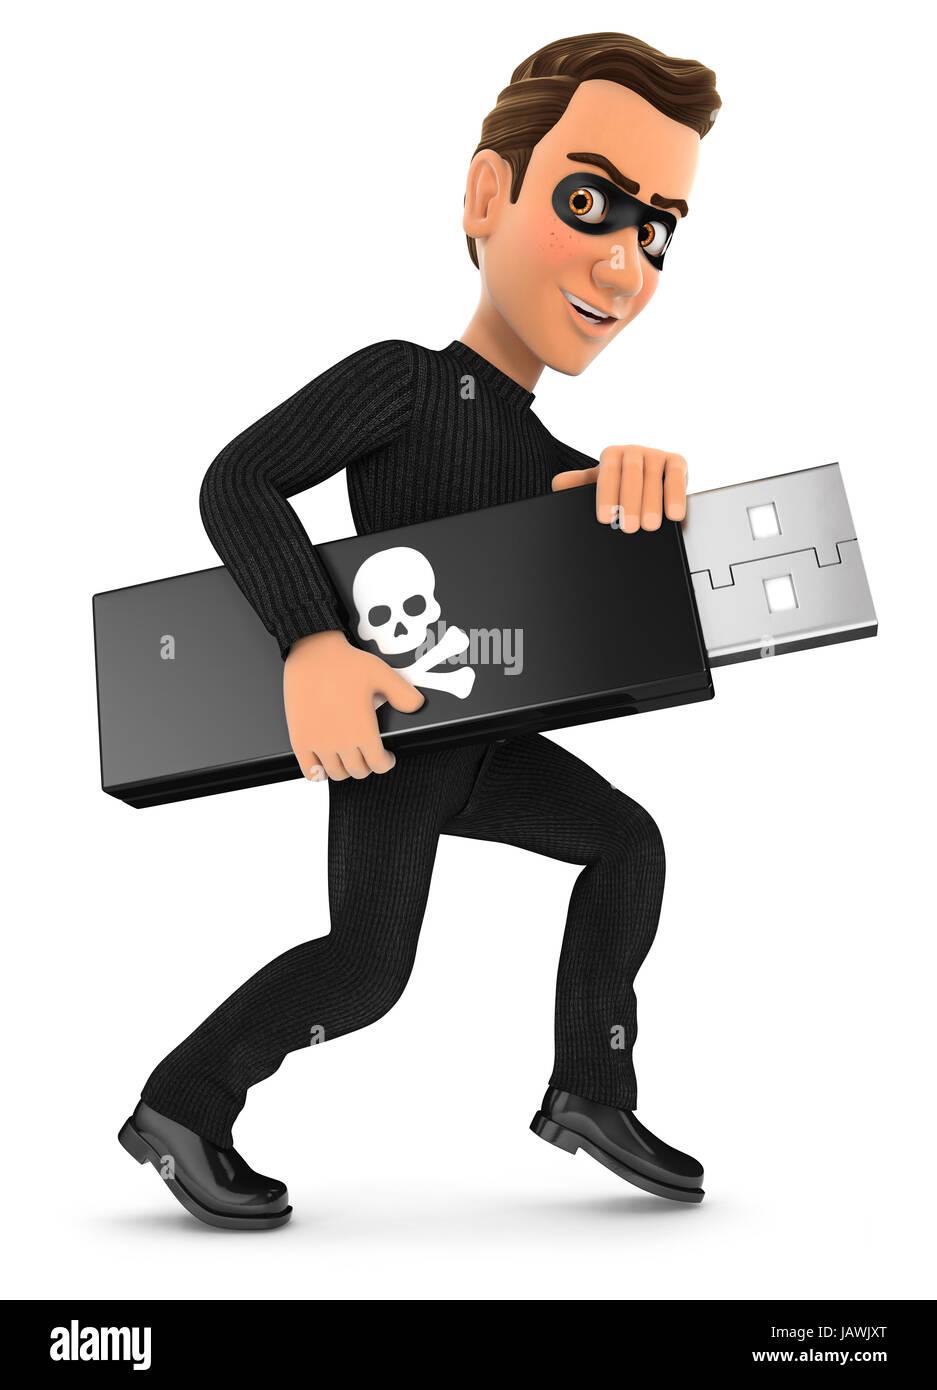 3d thief holding usb key, illustration with isolated white background Stock Photo